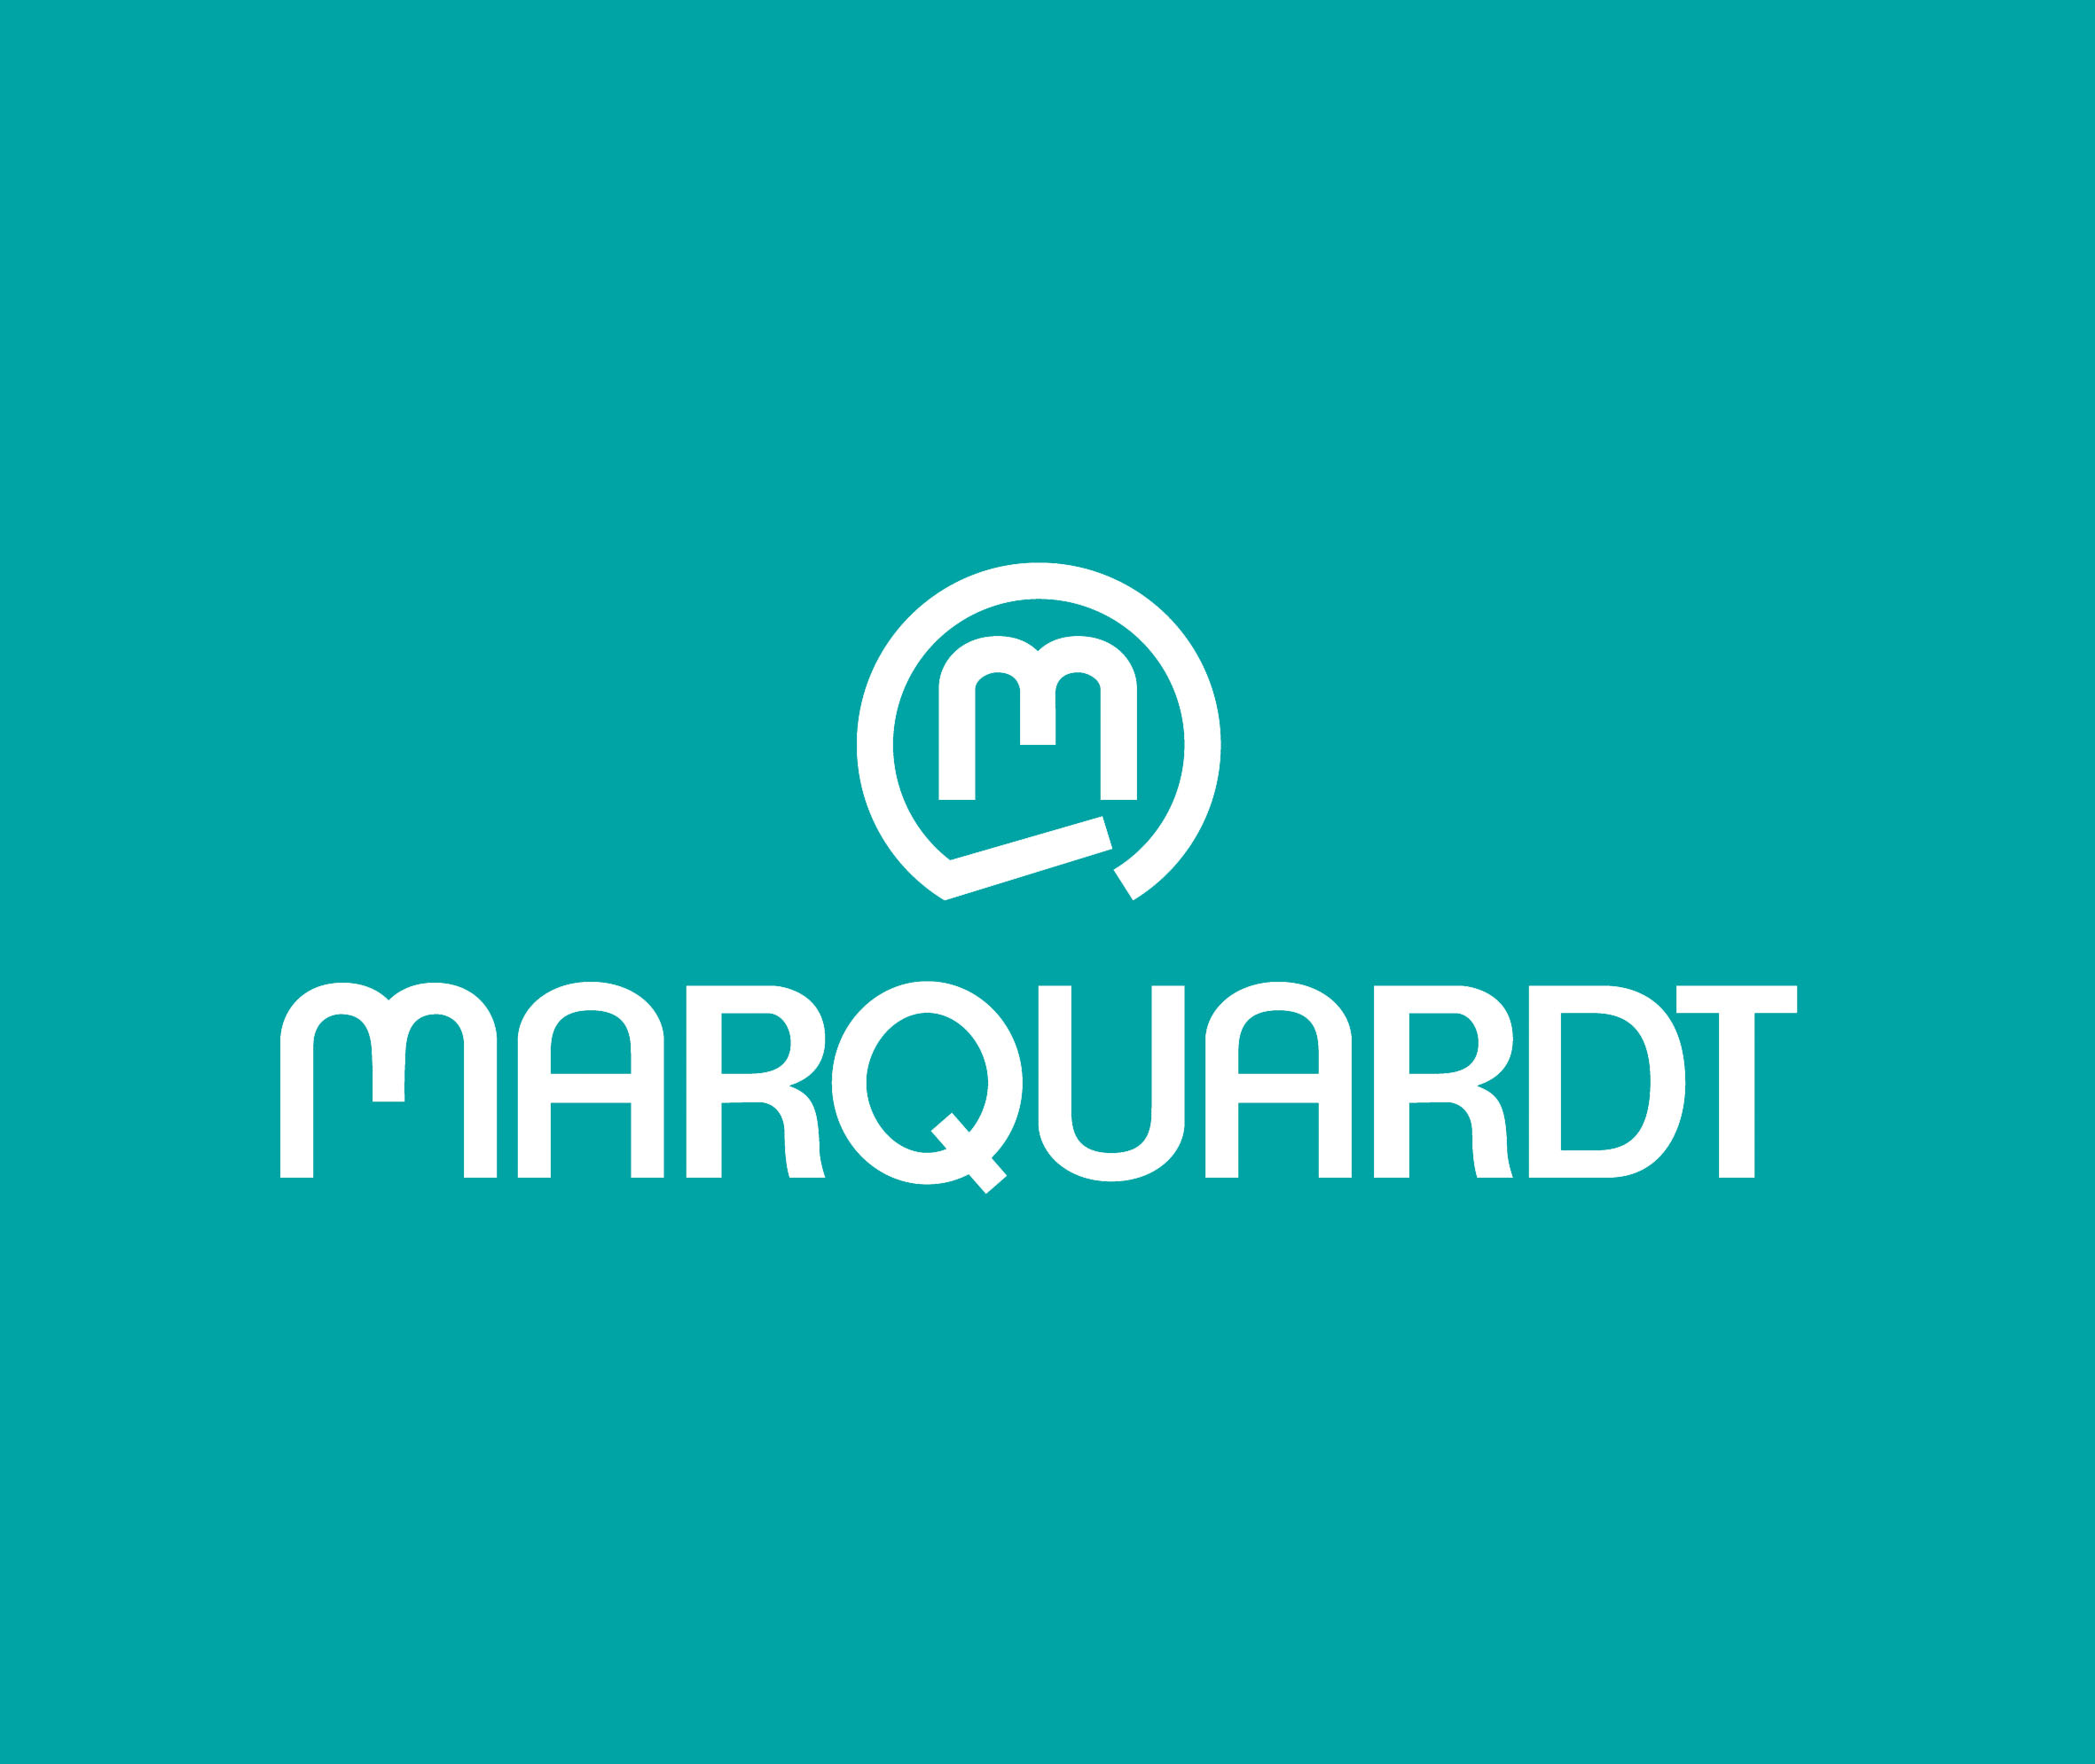 Marquardt_Logo_turquoise_rgb.jpg